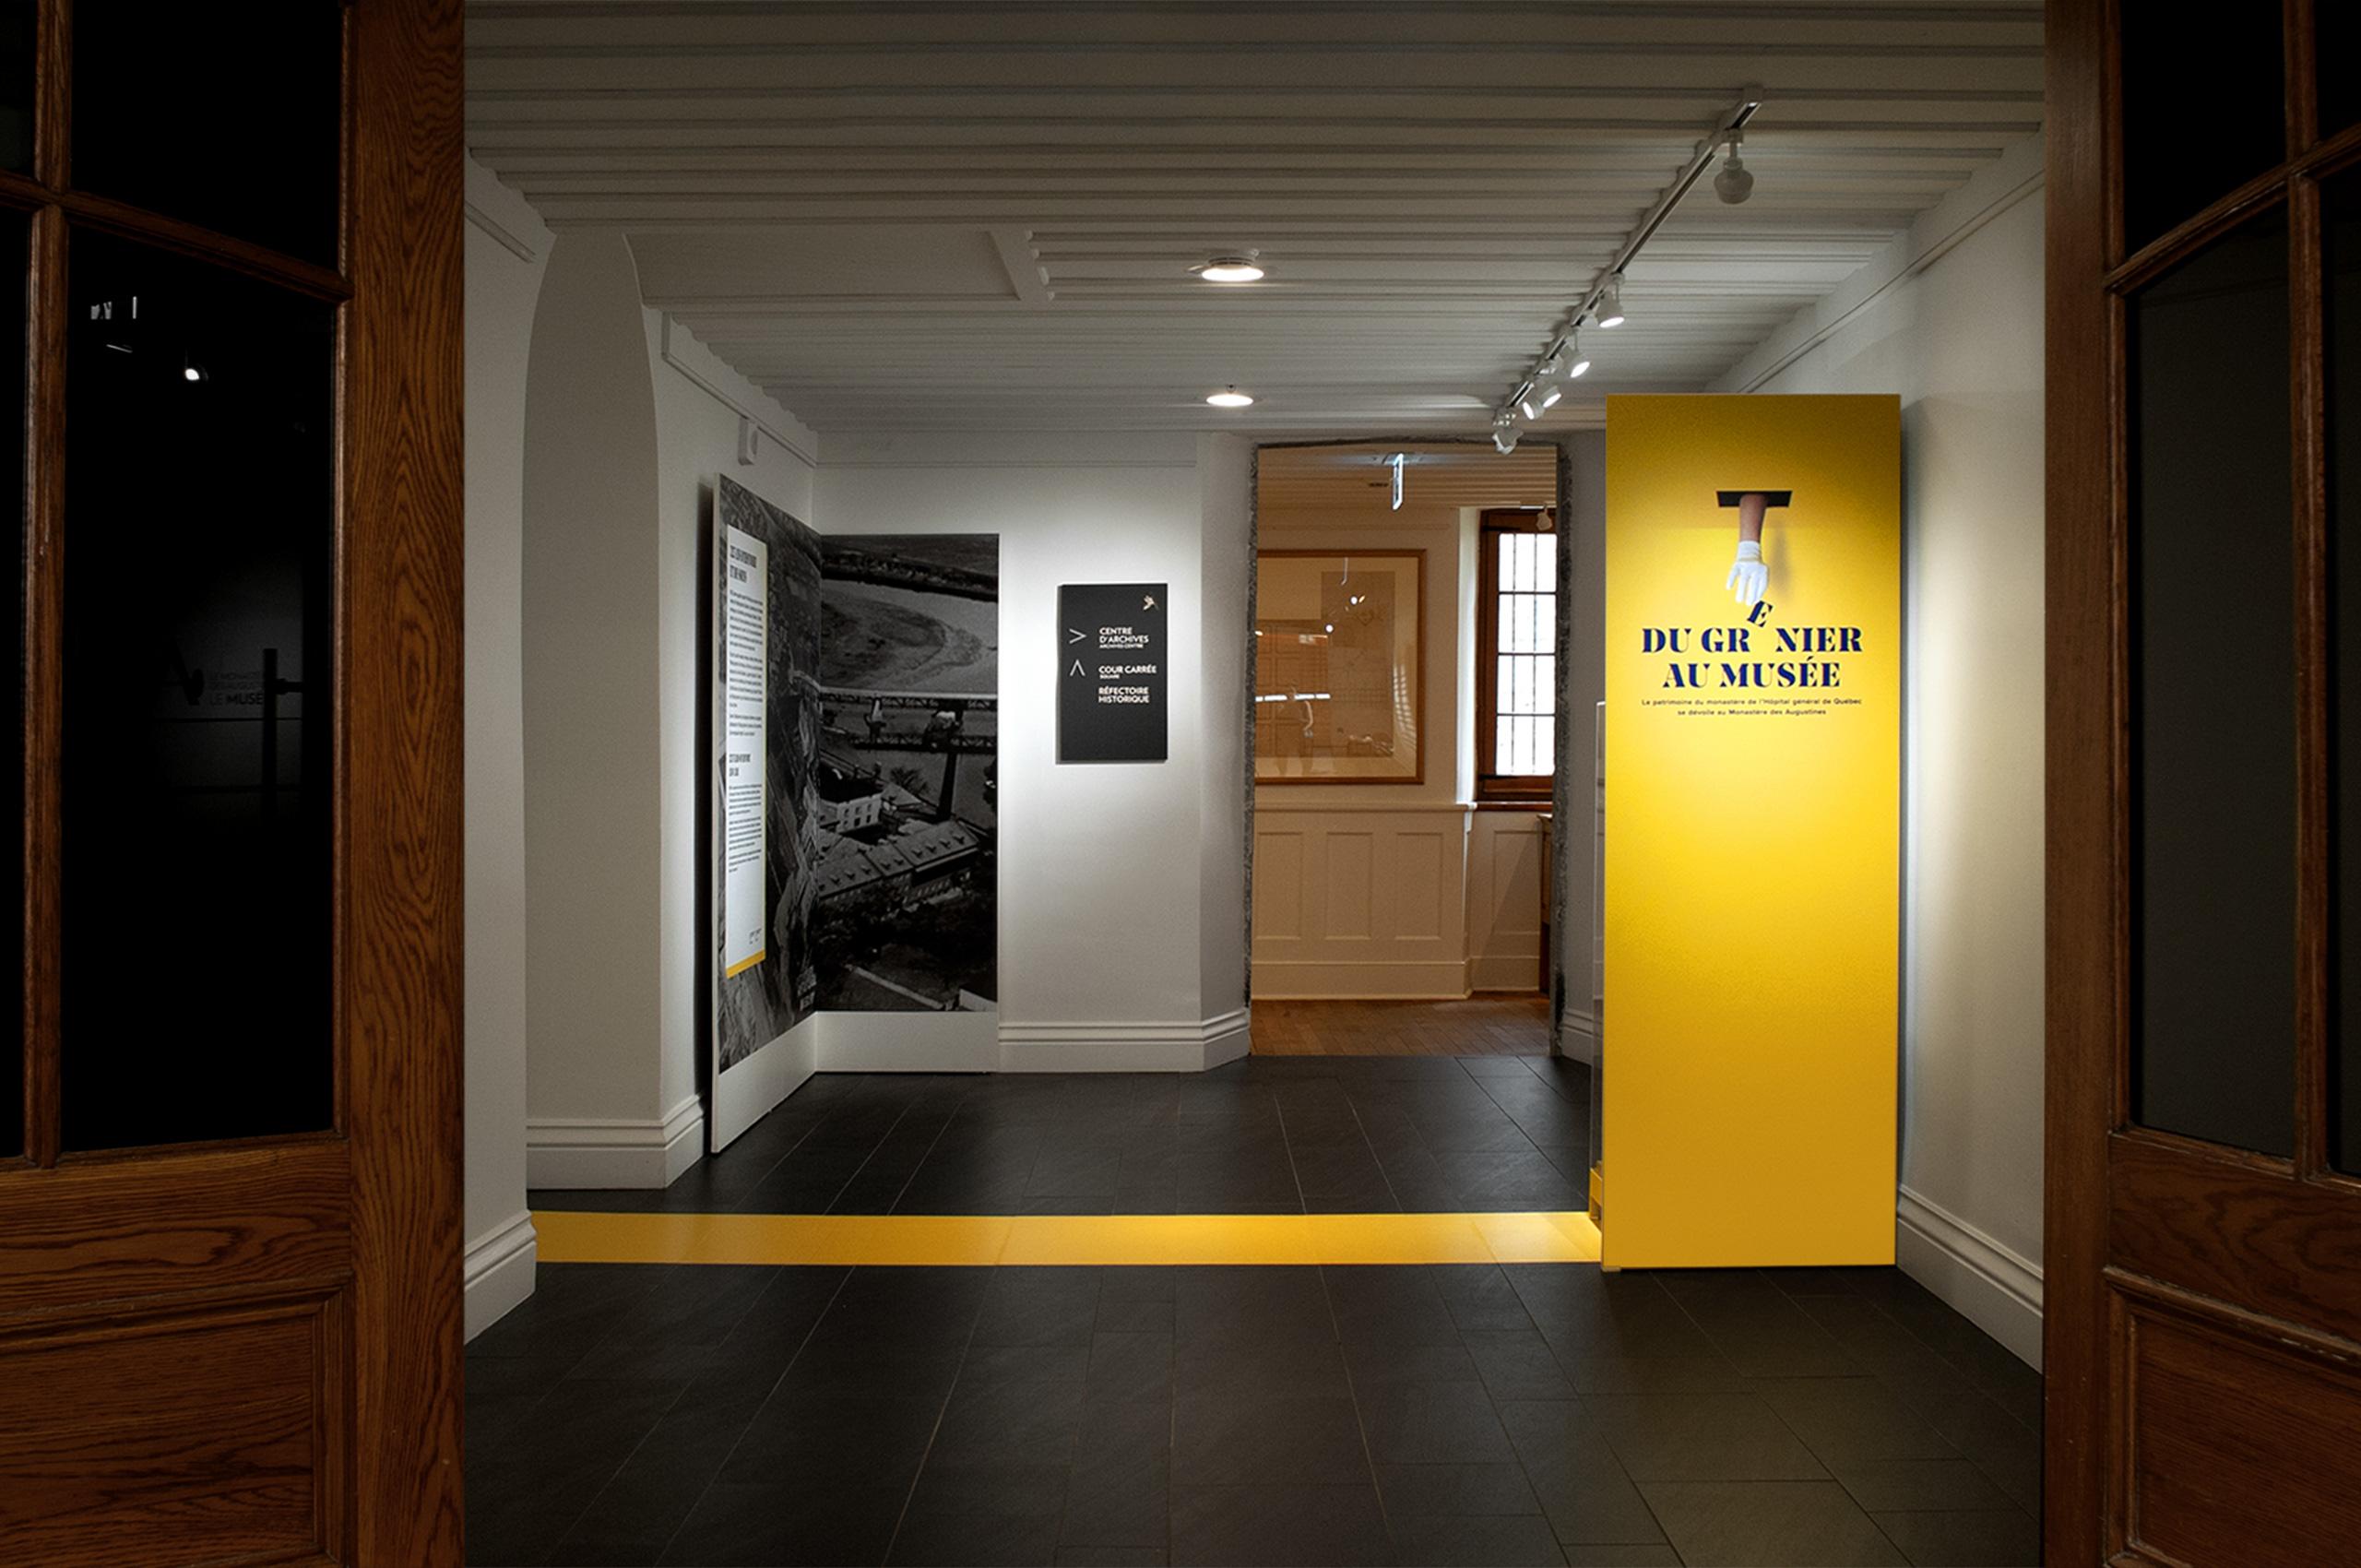 Grenier-au-musee_hall